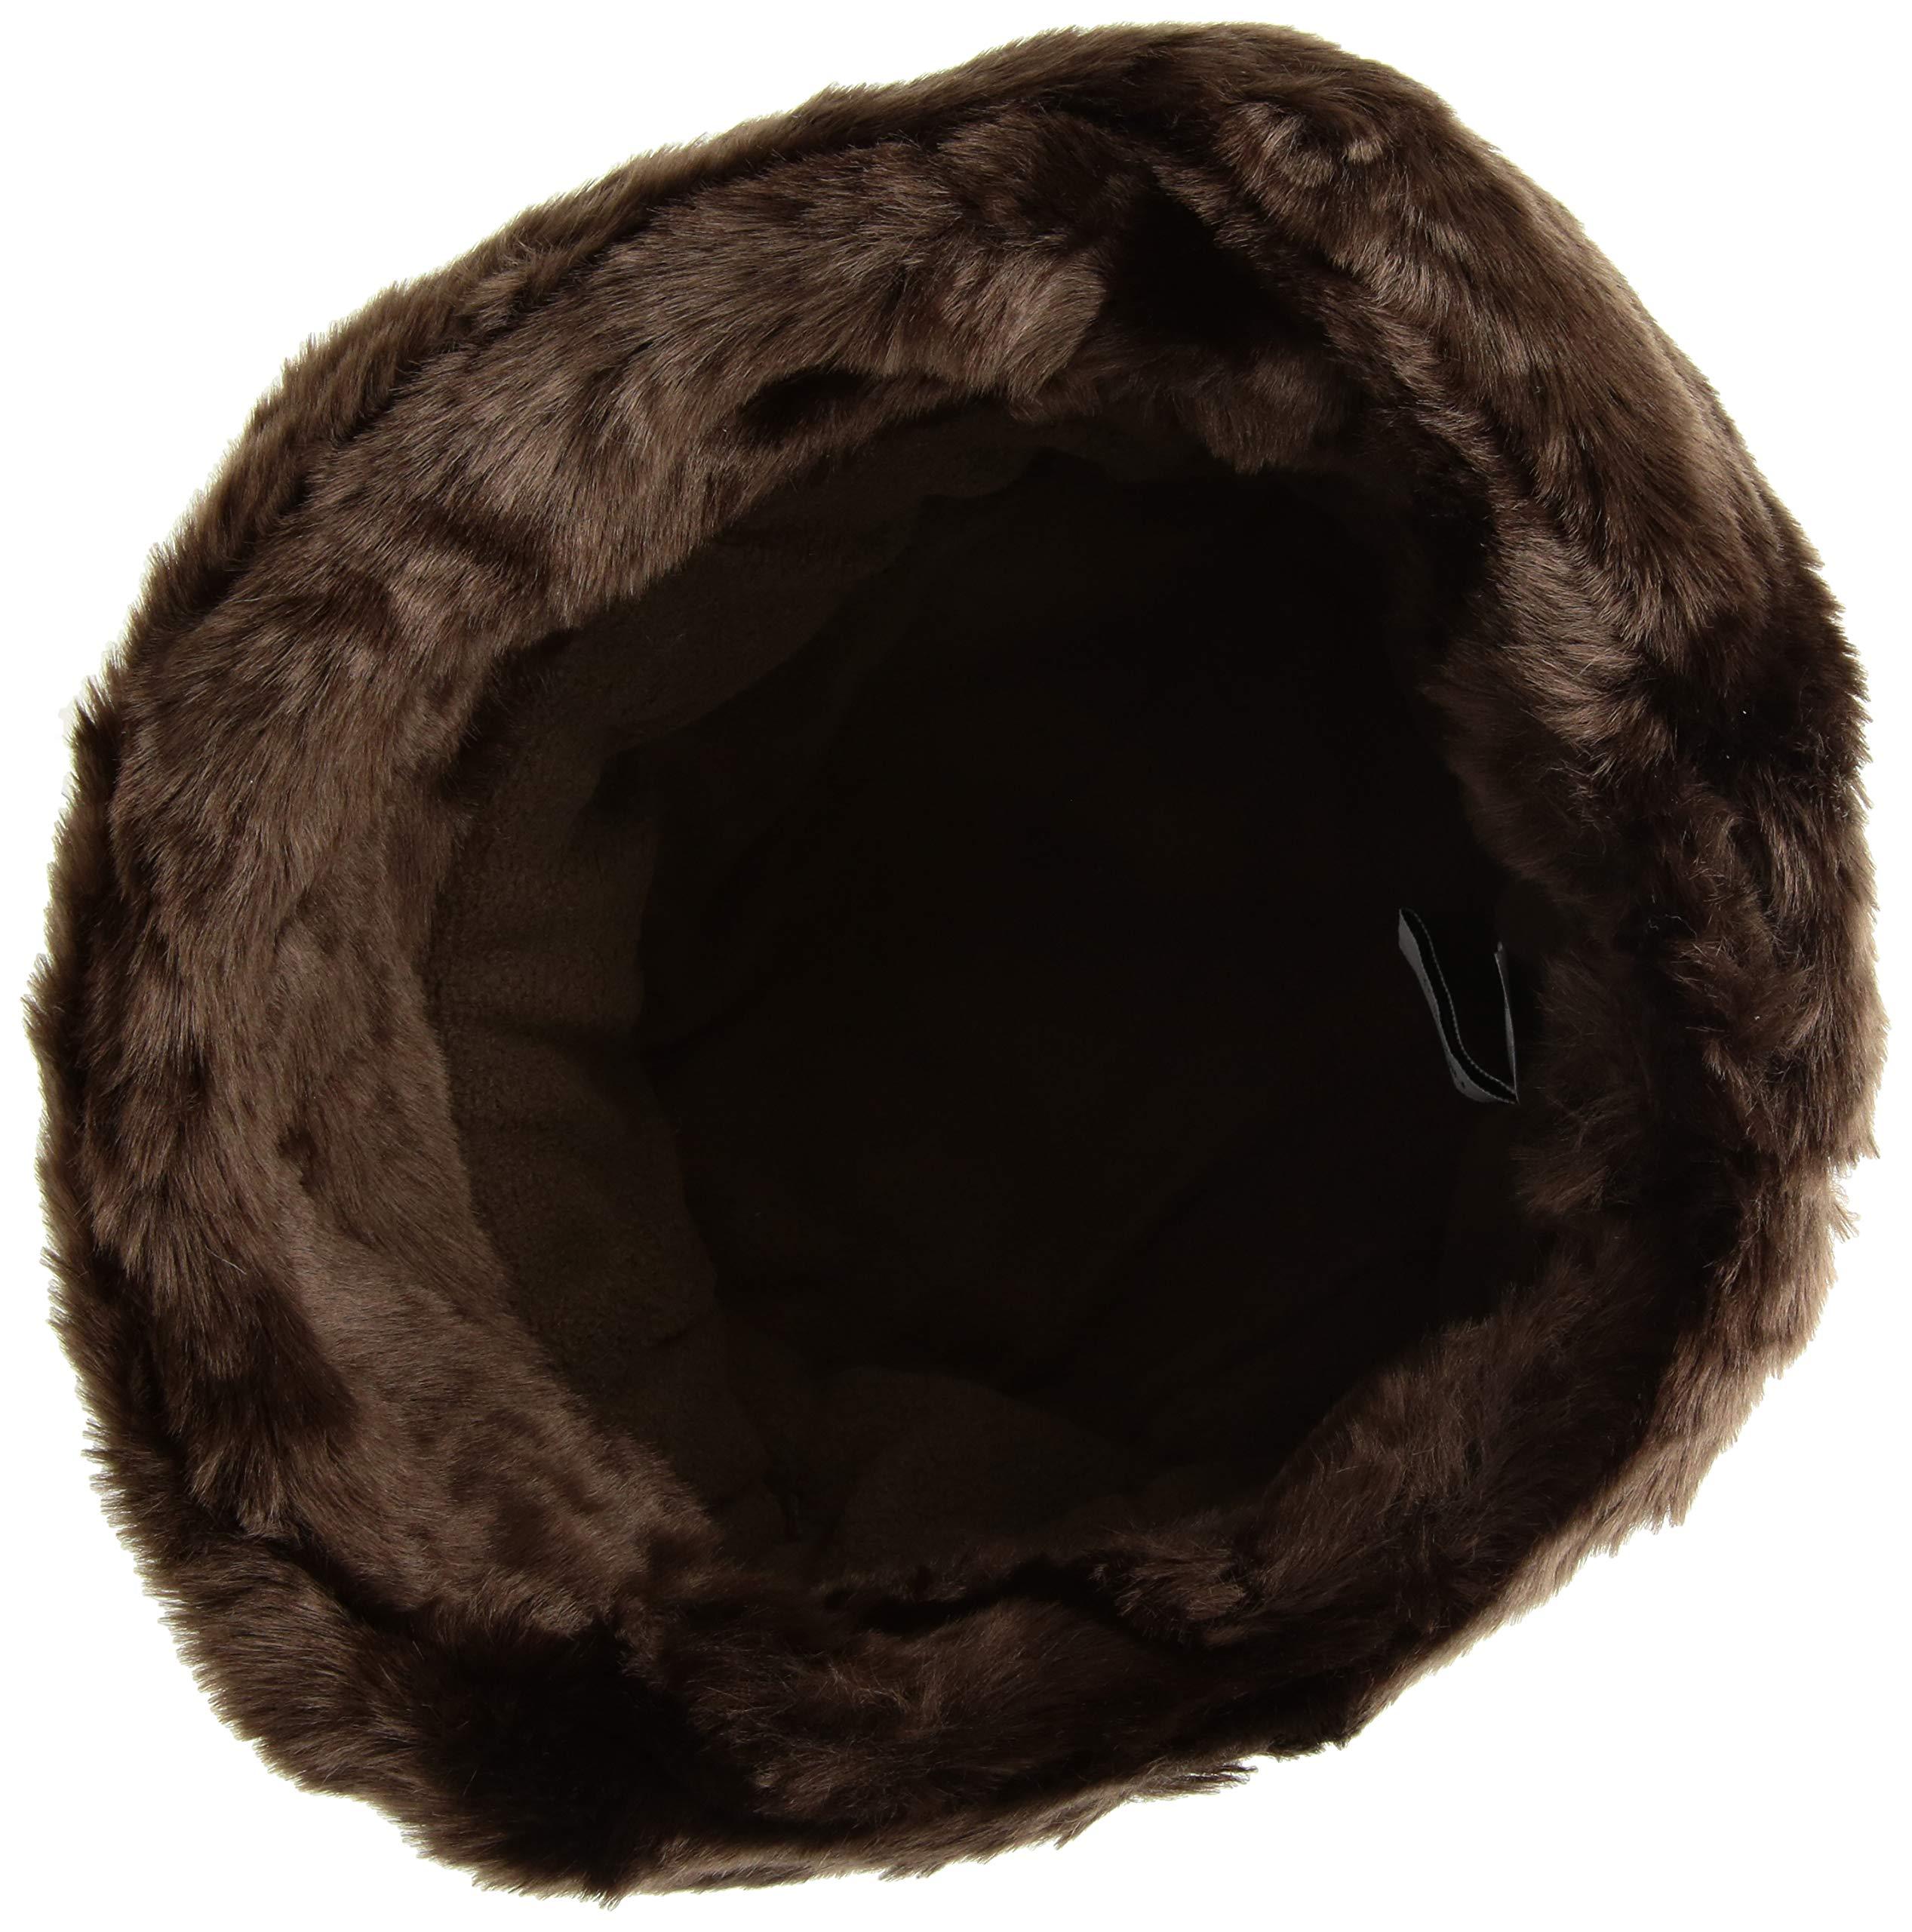 Nine West Women's Faux Fur Cuff Cloche, Brown one Size by Nine West (Image #3)